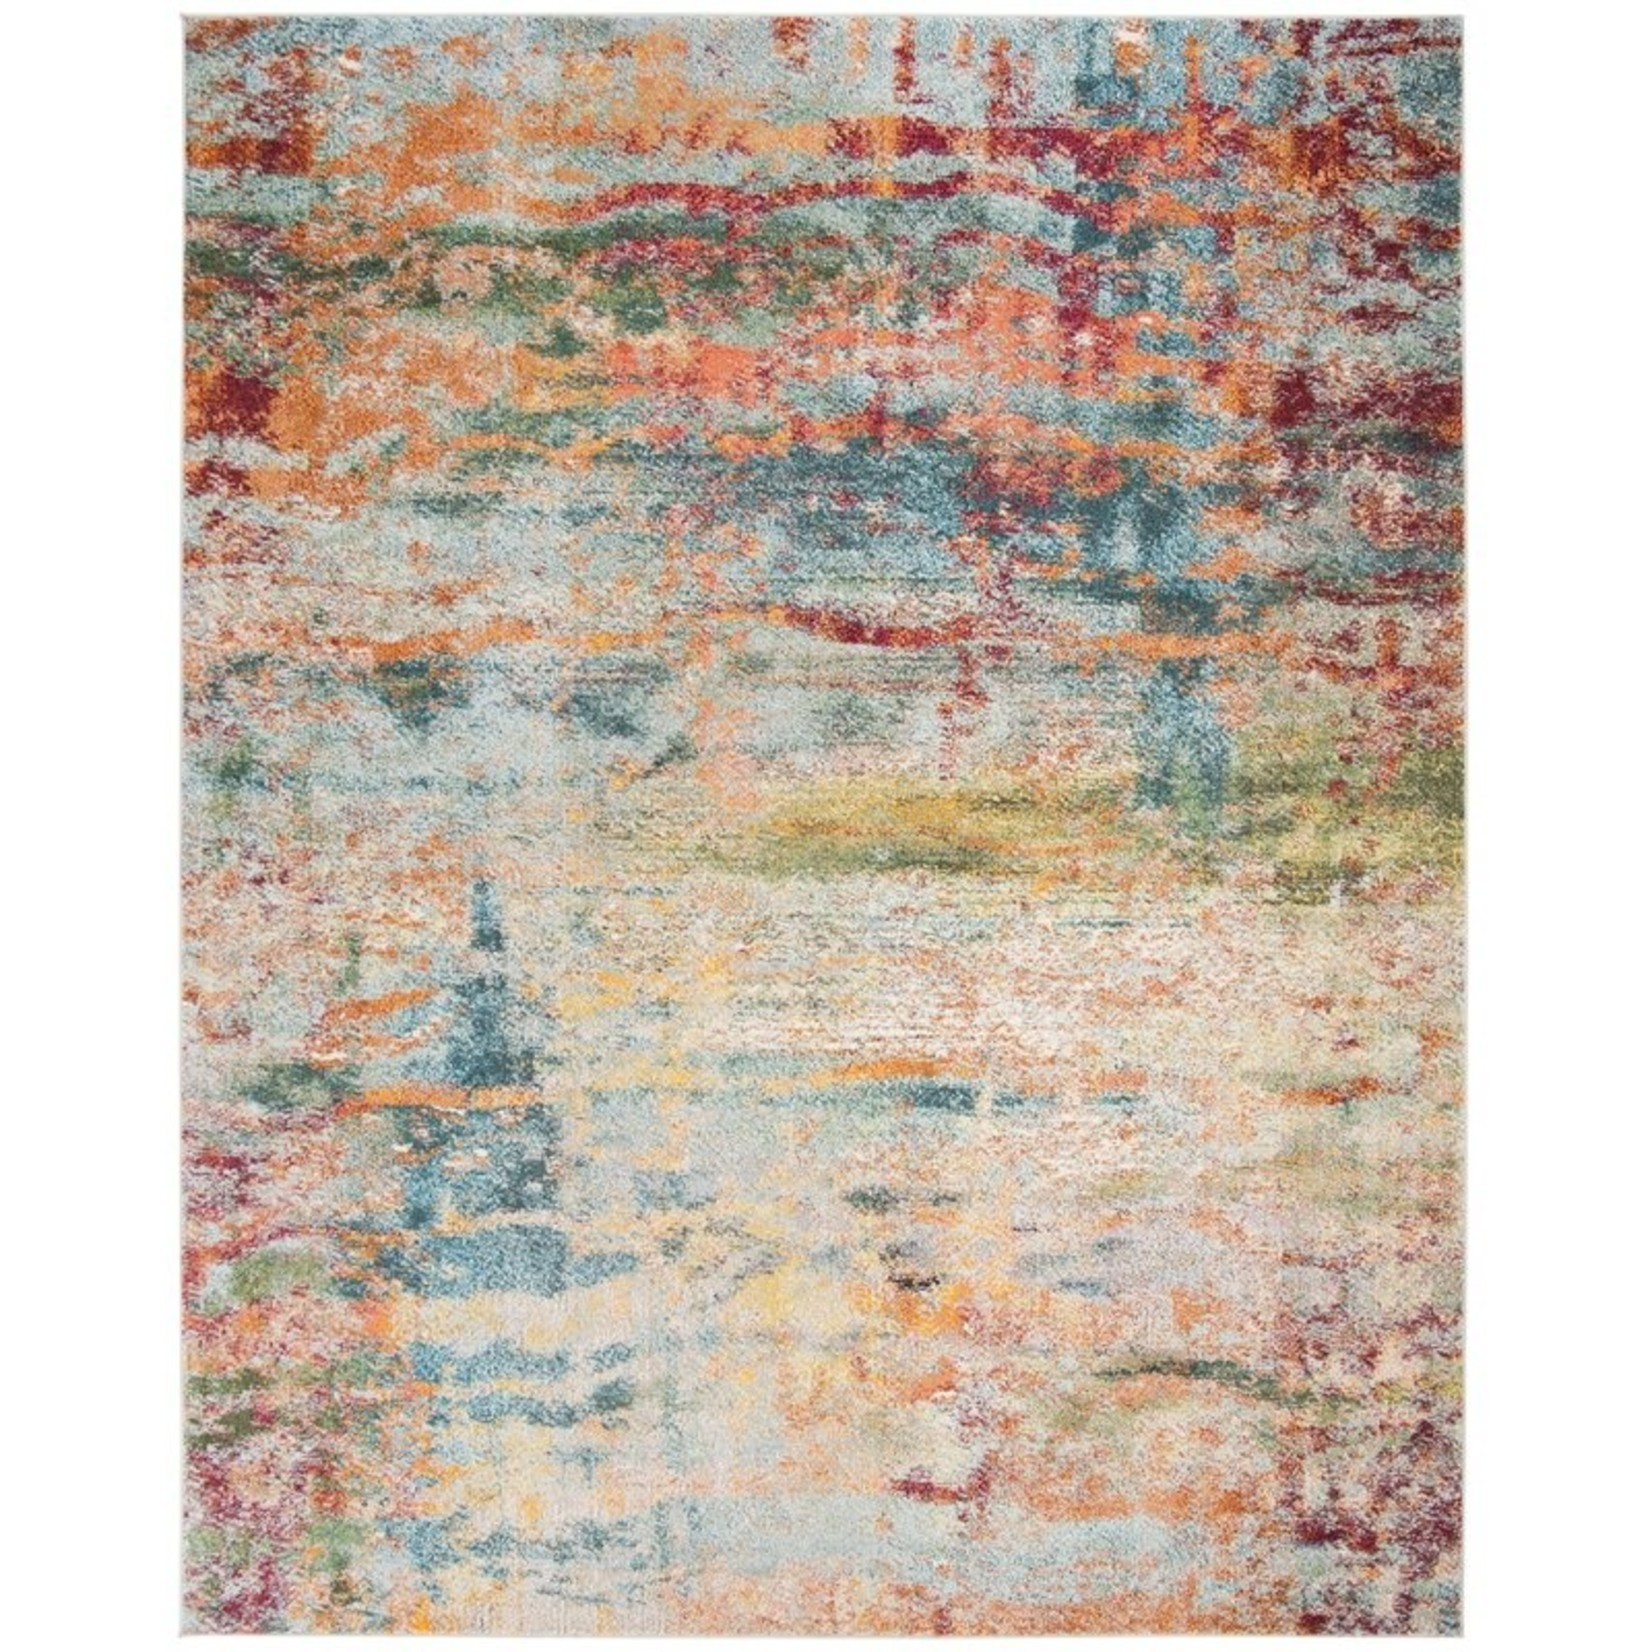 *9' x 12' - Muhan Abstract Teal/Orange Area Rug